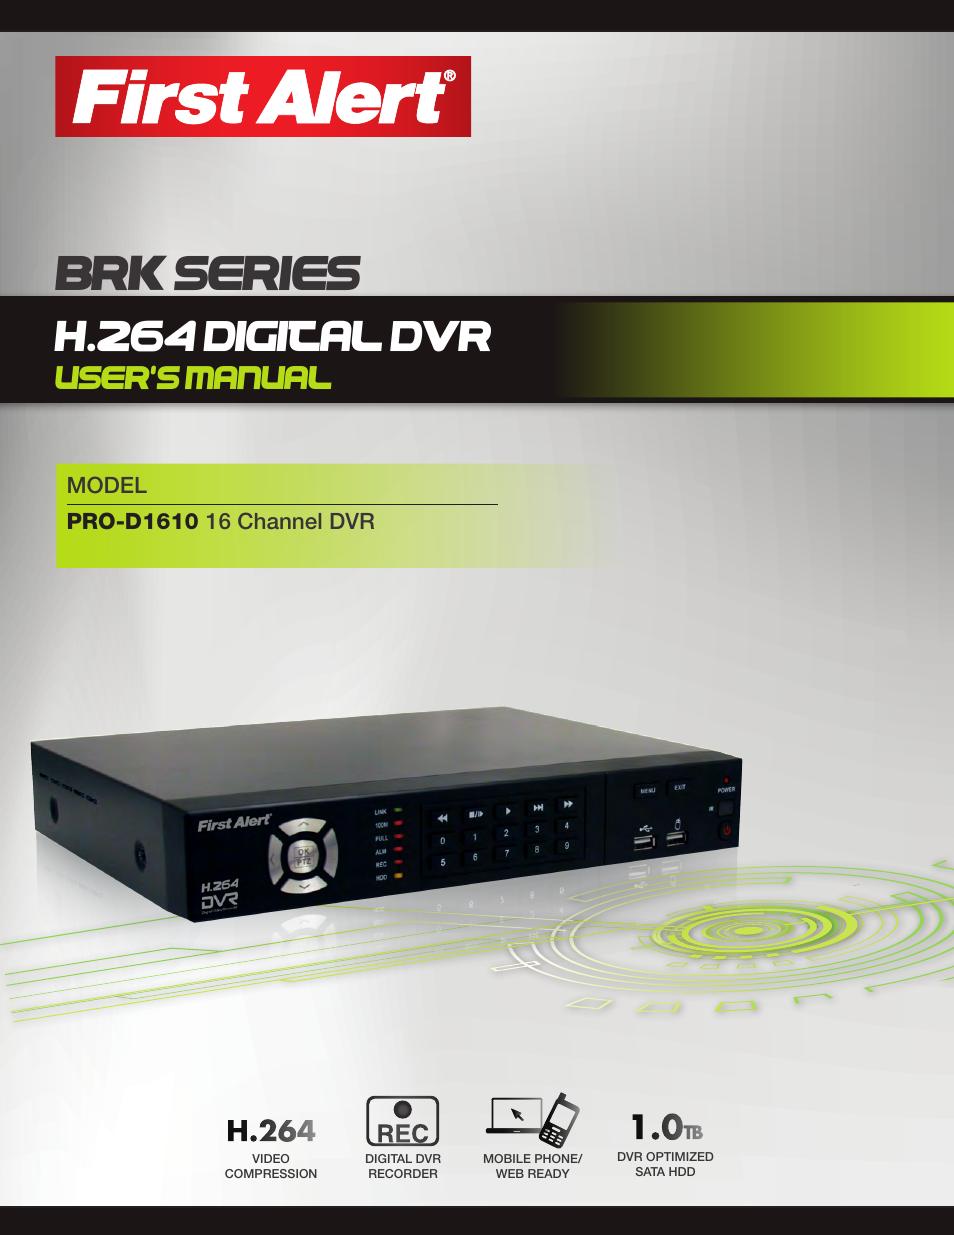 first alert h 264 digital dvr pro d1610 user manual 48 pages rh manualsdir com Armor View DVR H 264 Manual H.264 DVR Factory Reset